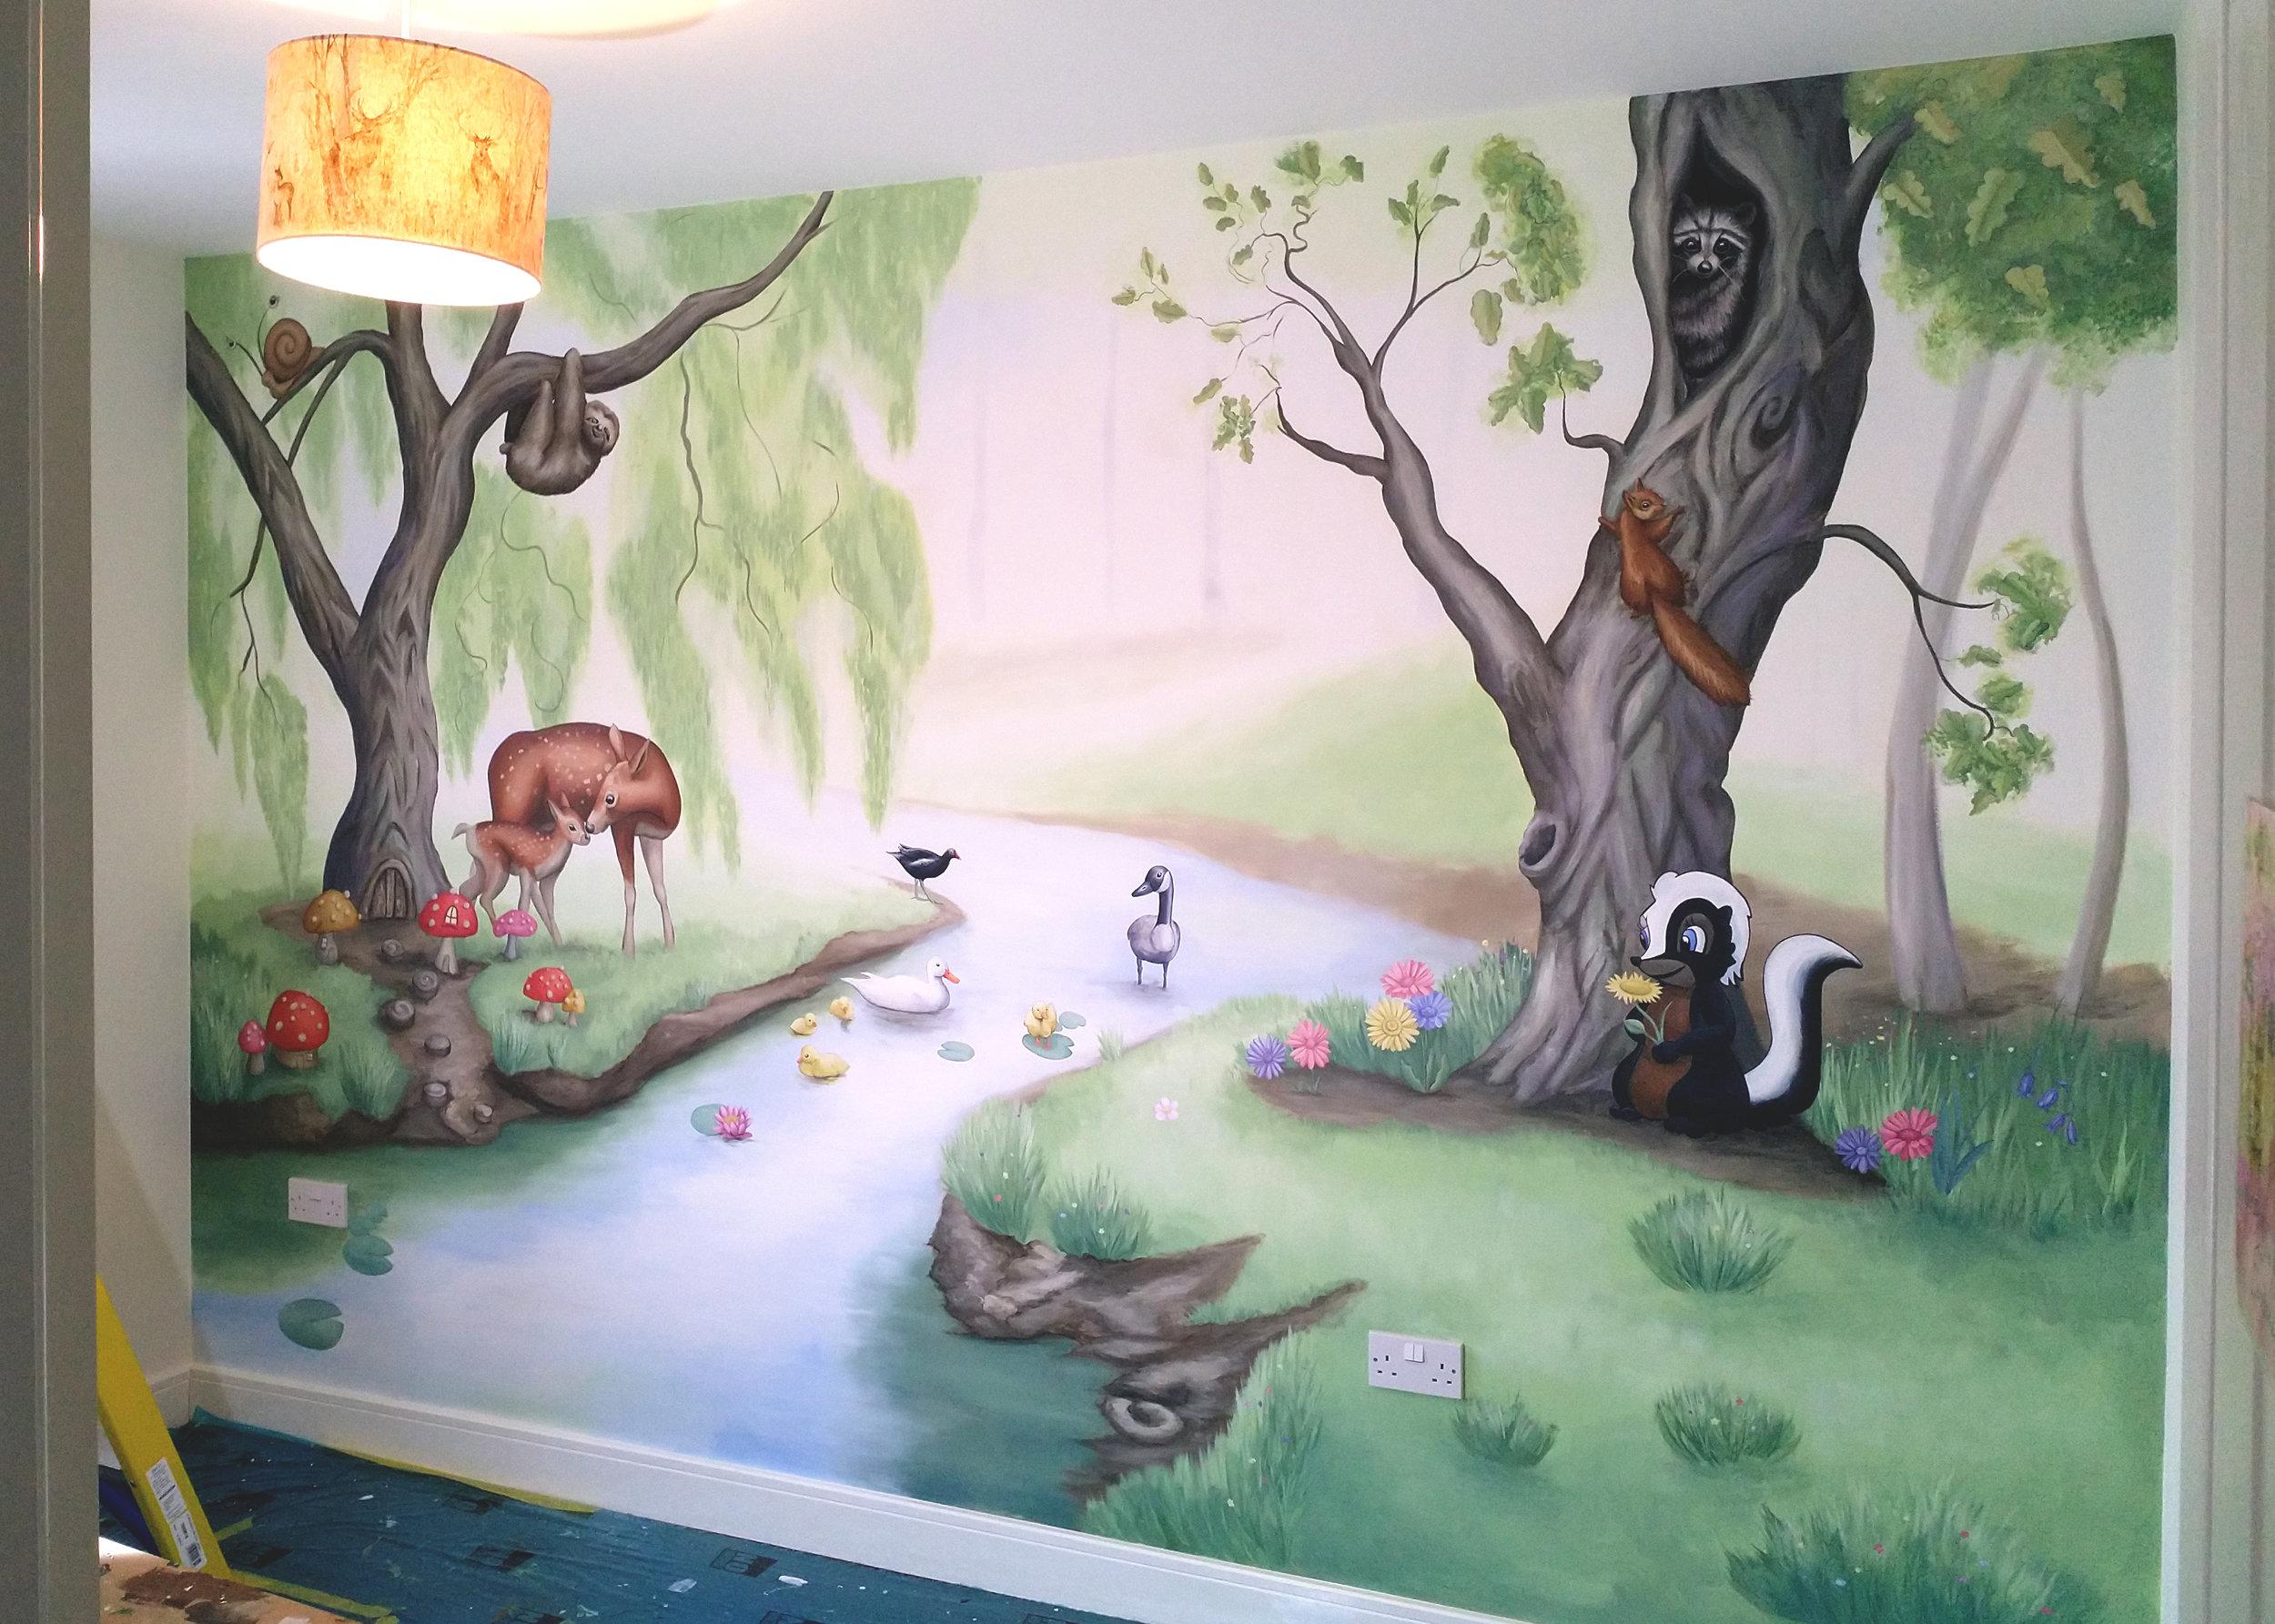 Woodland Creature mural